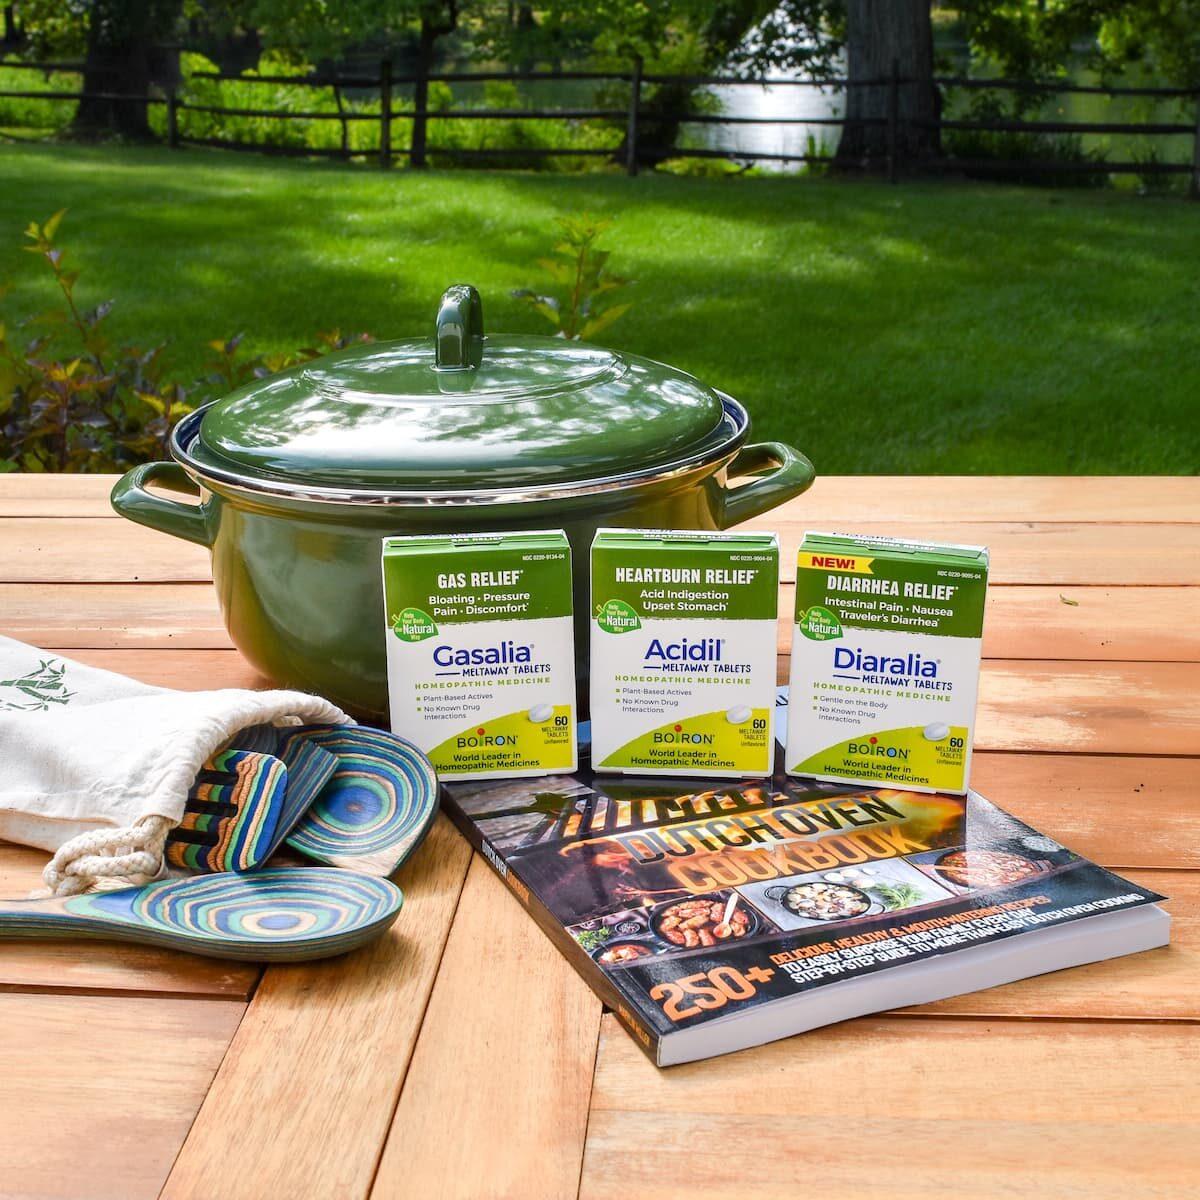 dutch oven, cookbook, utensils, digestive tablets on picnic table